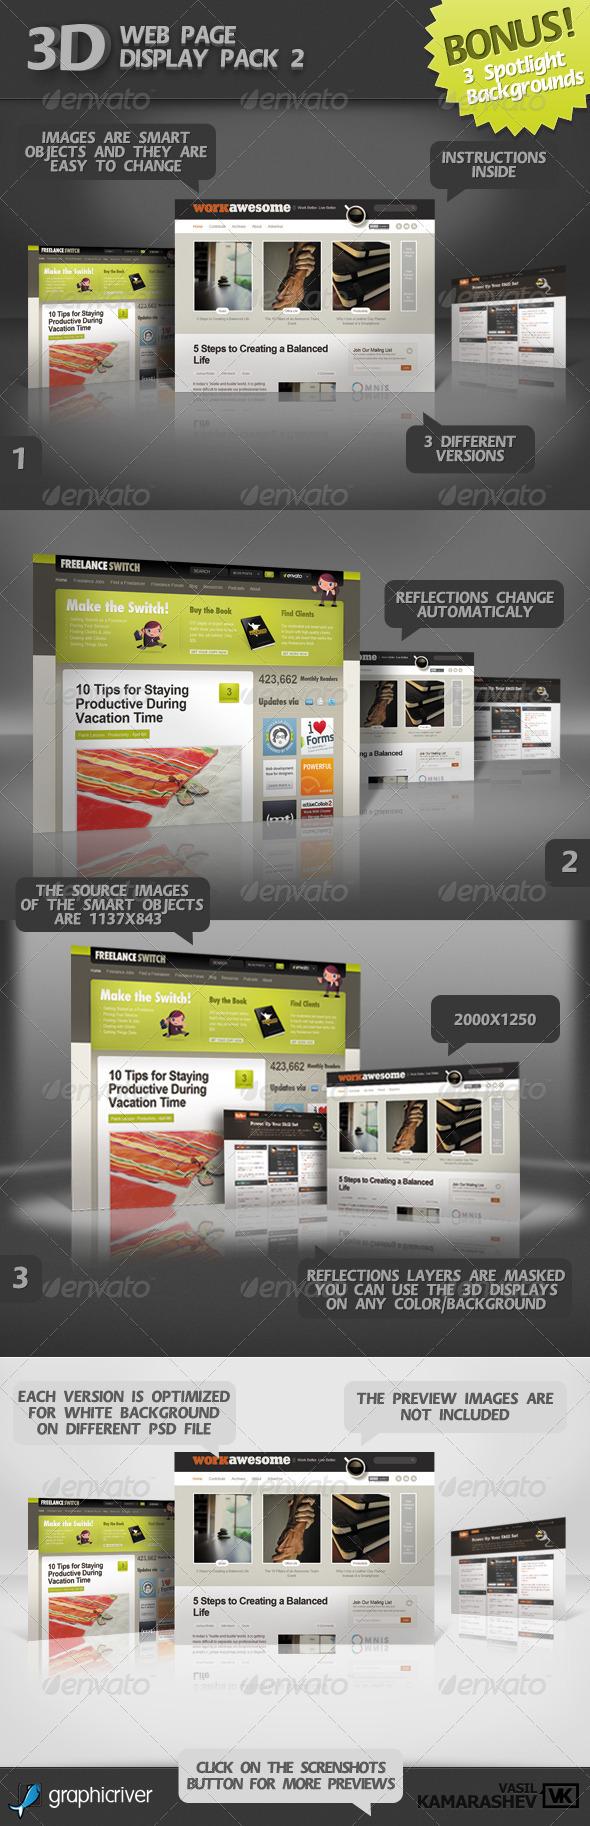 3D Web Page Display Pack 2 +BONUS 3 Spotlight BGs - Website Displays